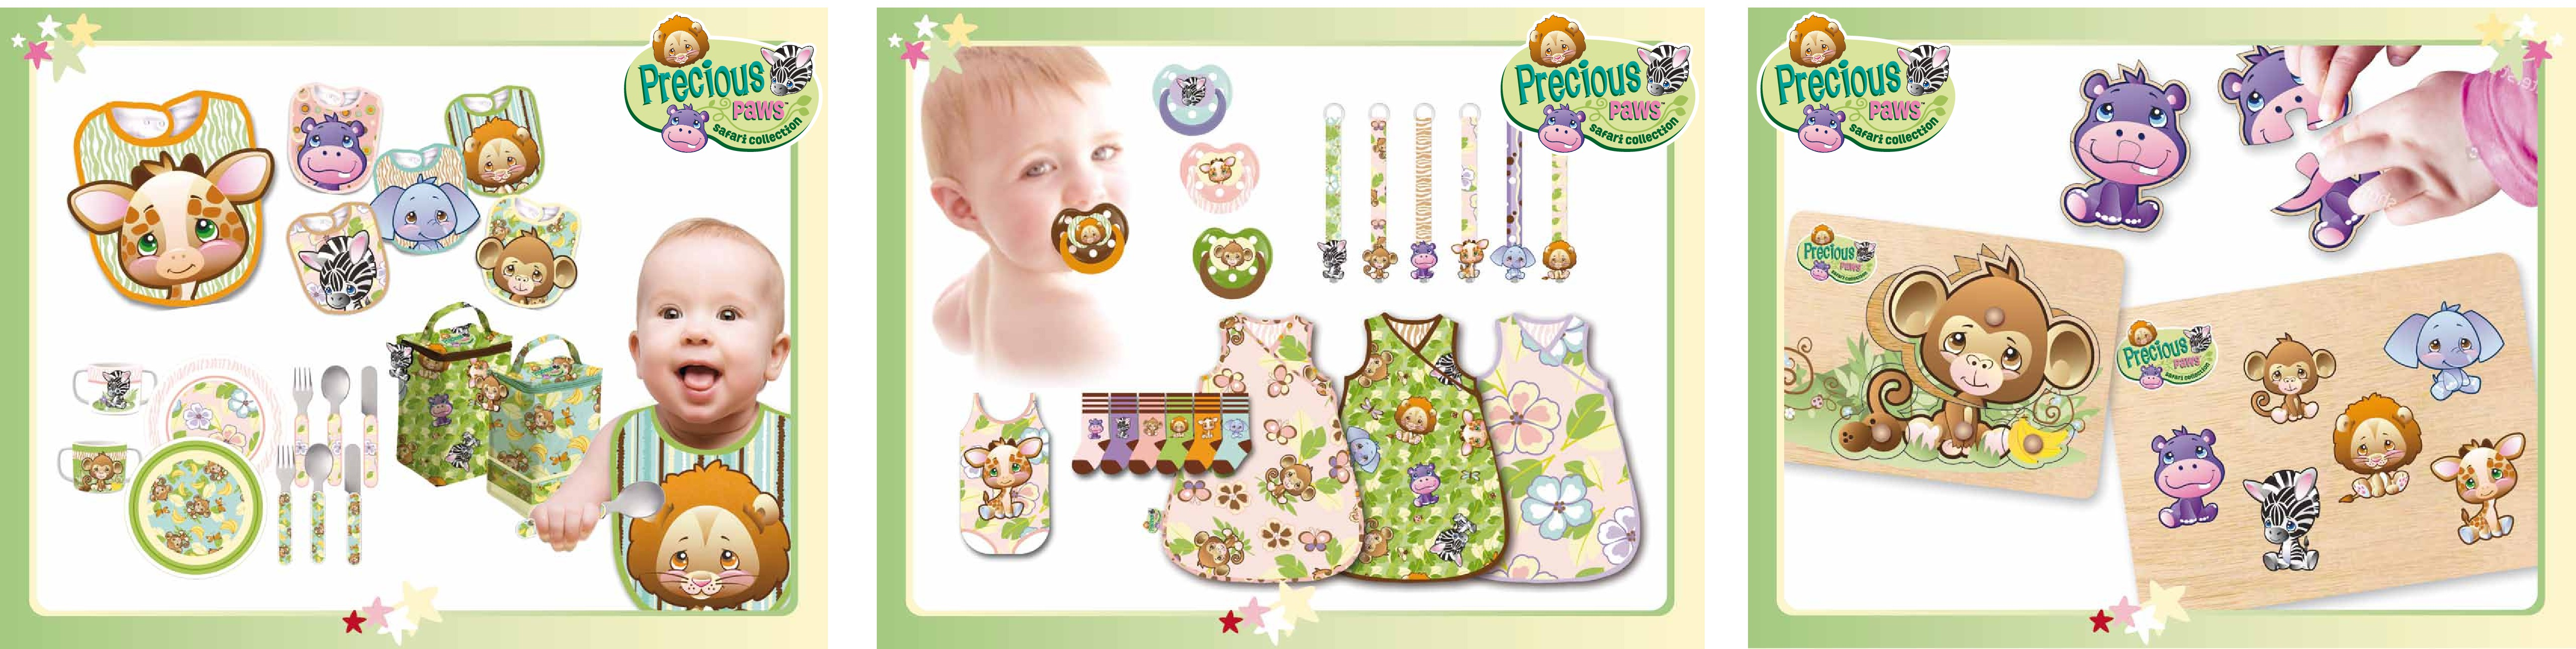 Design Adorable Children's Merchandise for our Precious Paws collection!